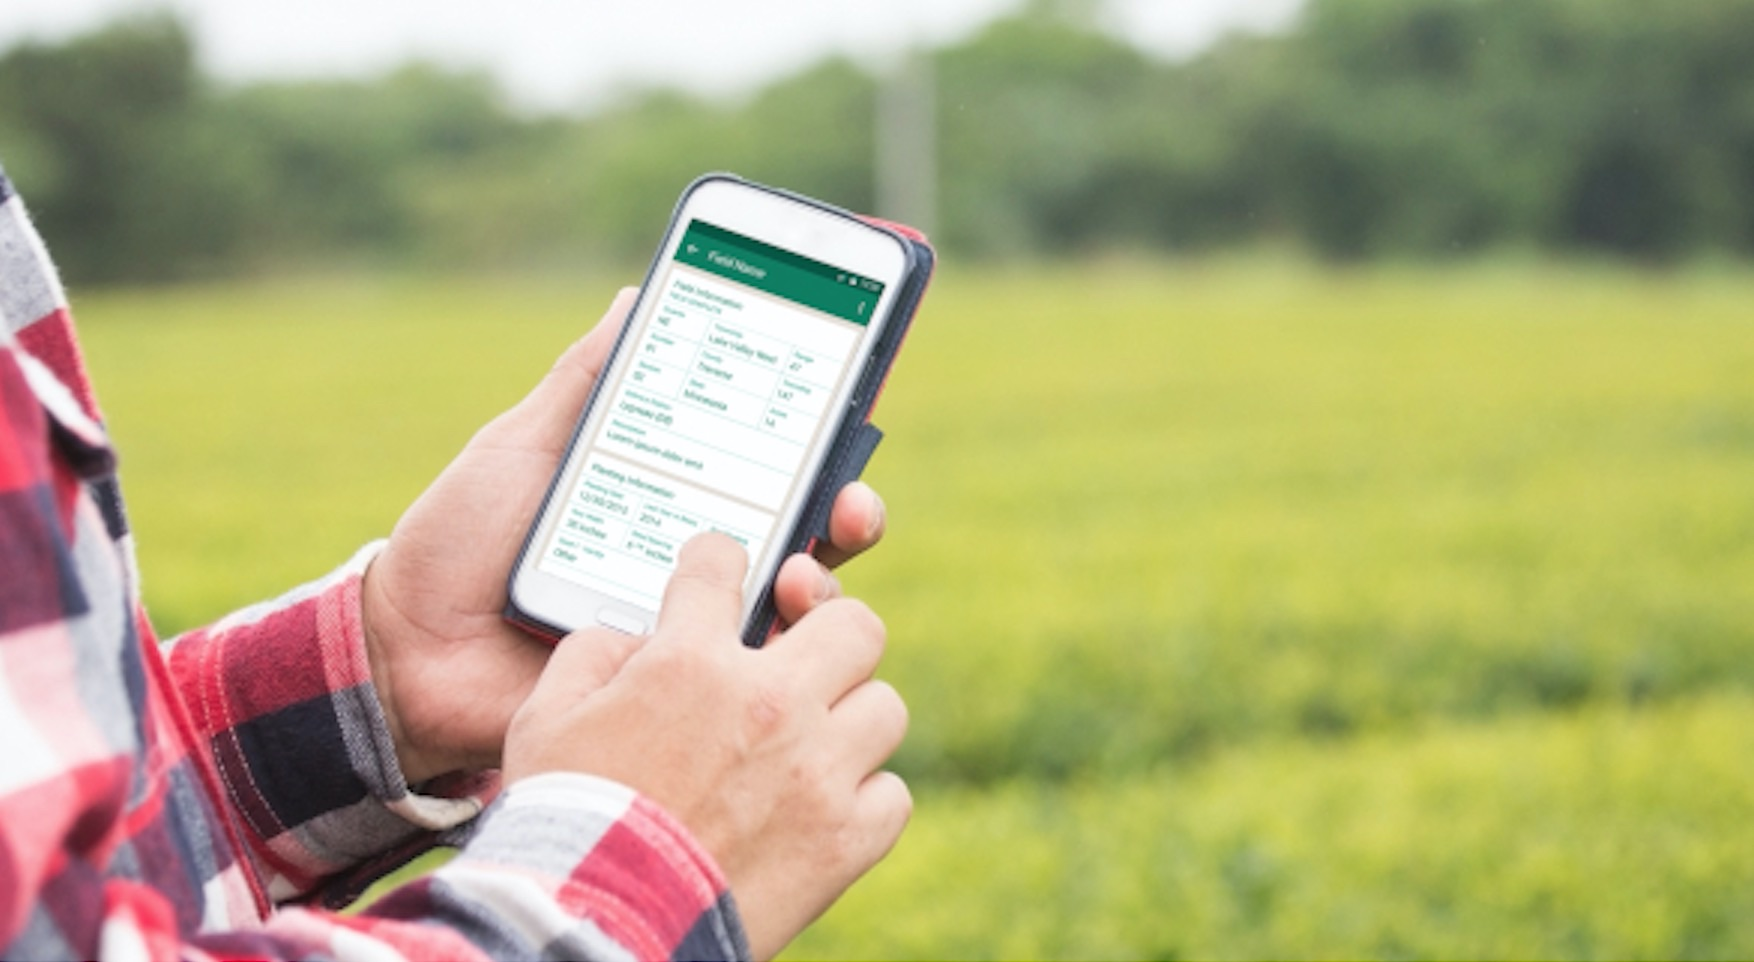 calculadora para análisis de inversión en tecnología de siembra